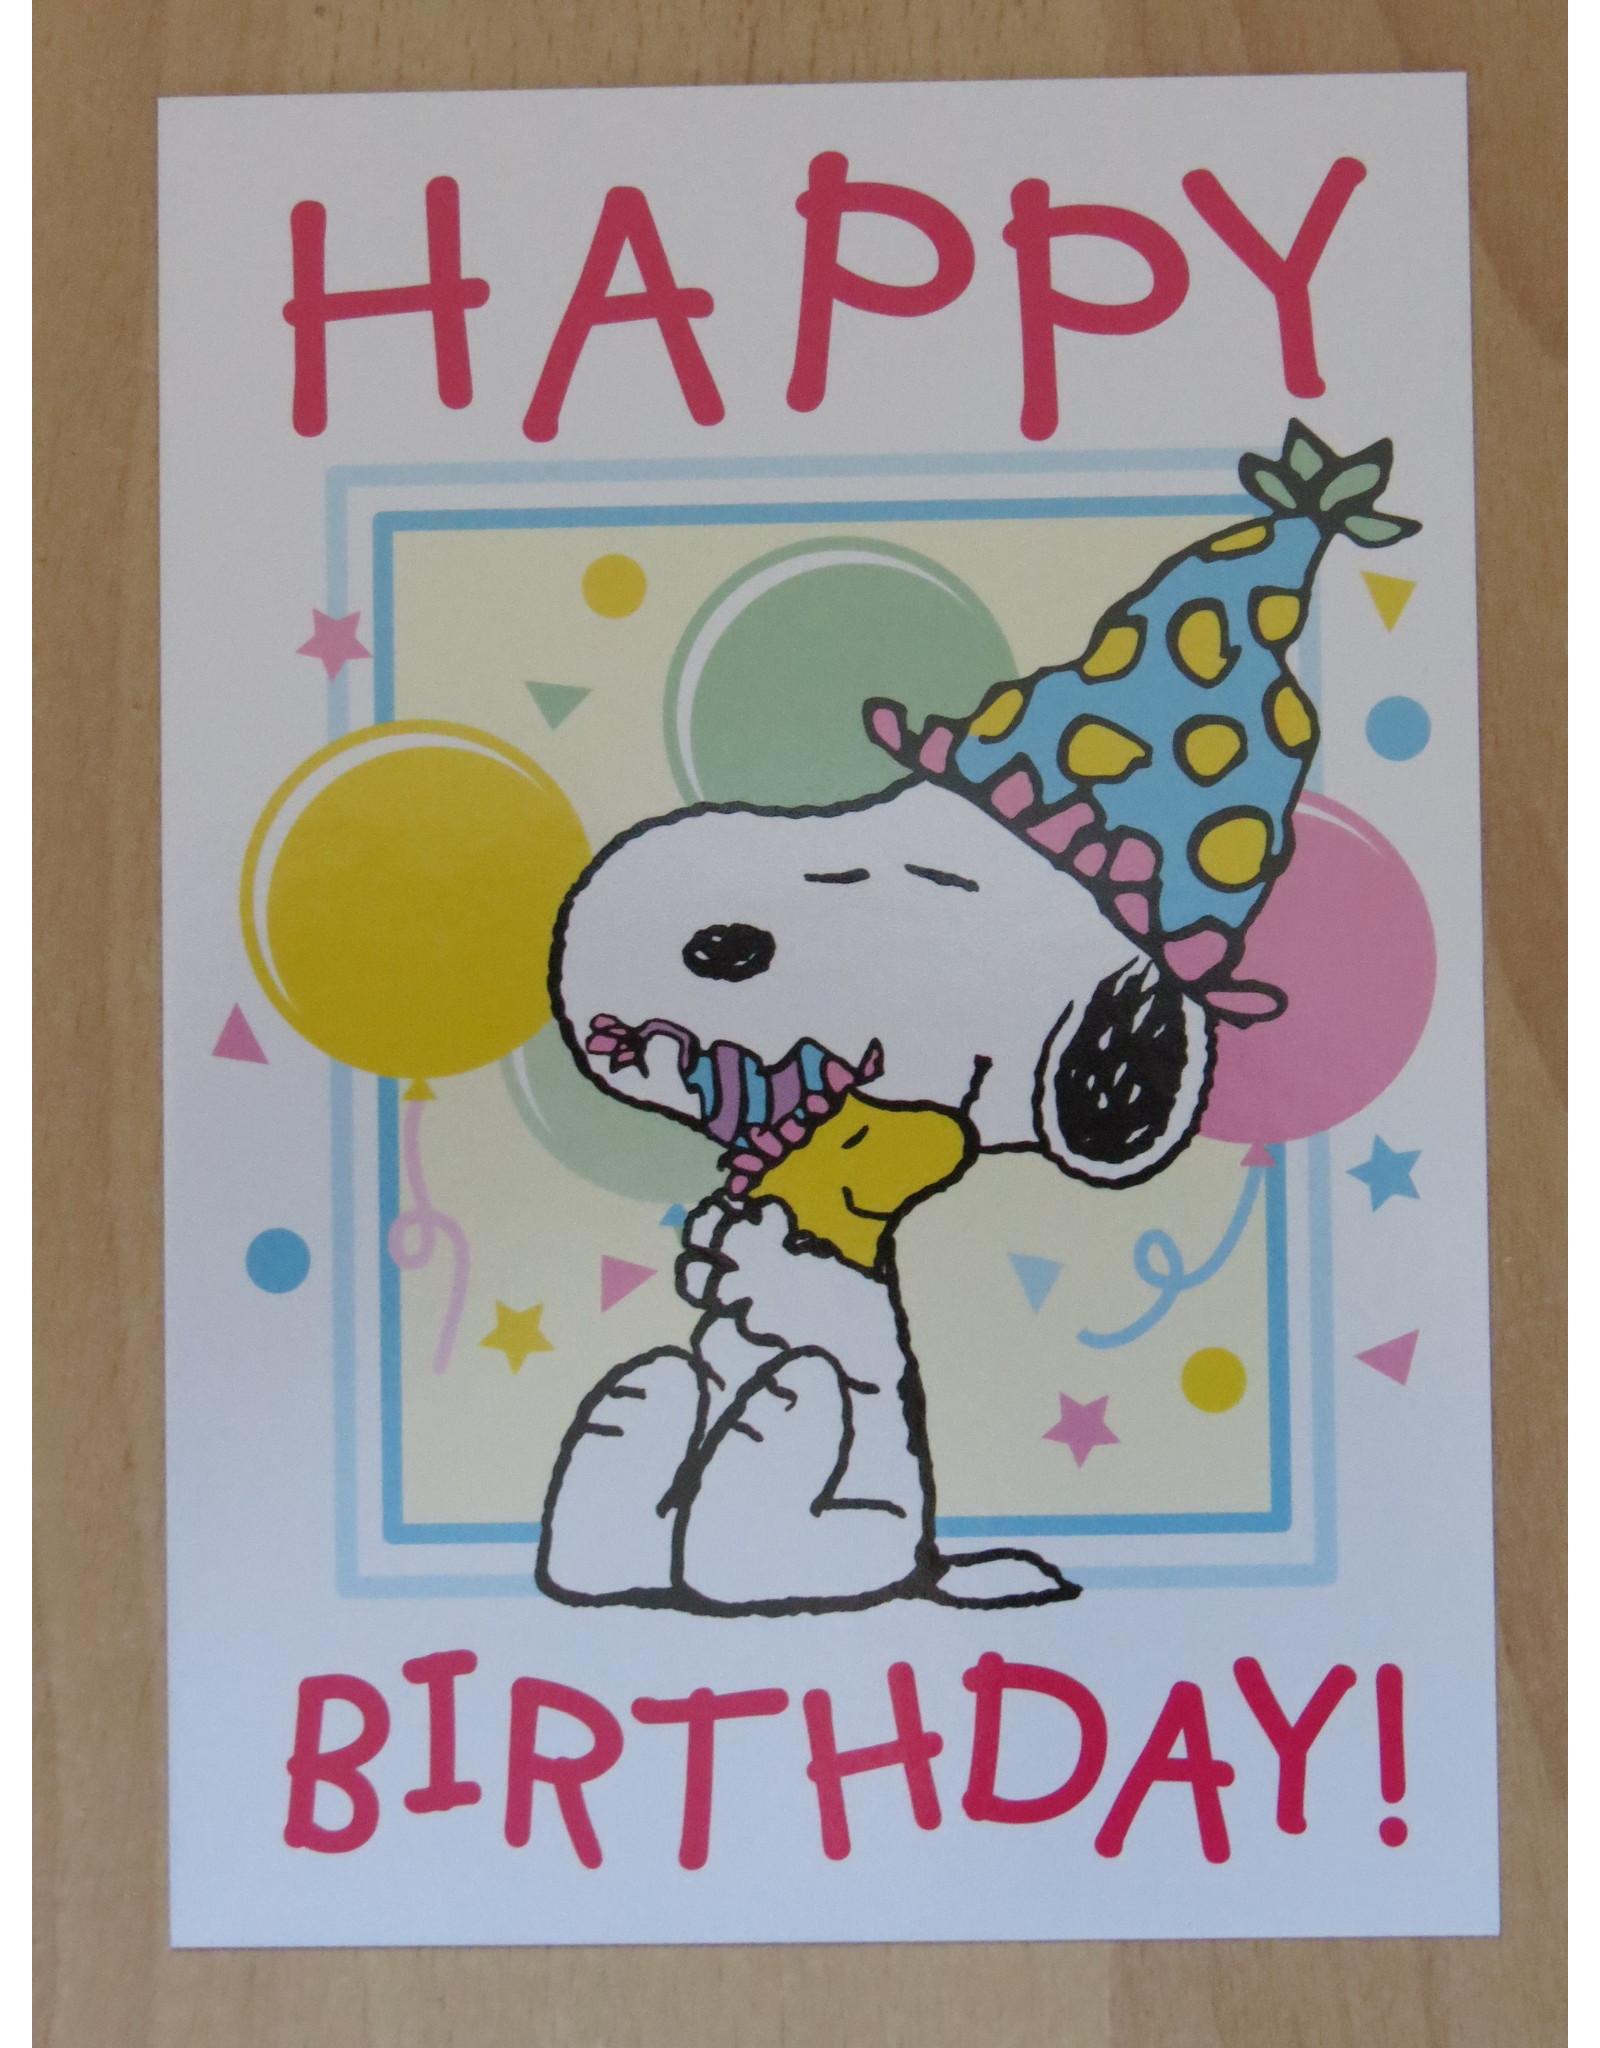 Snoopy birthday card - hugs